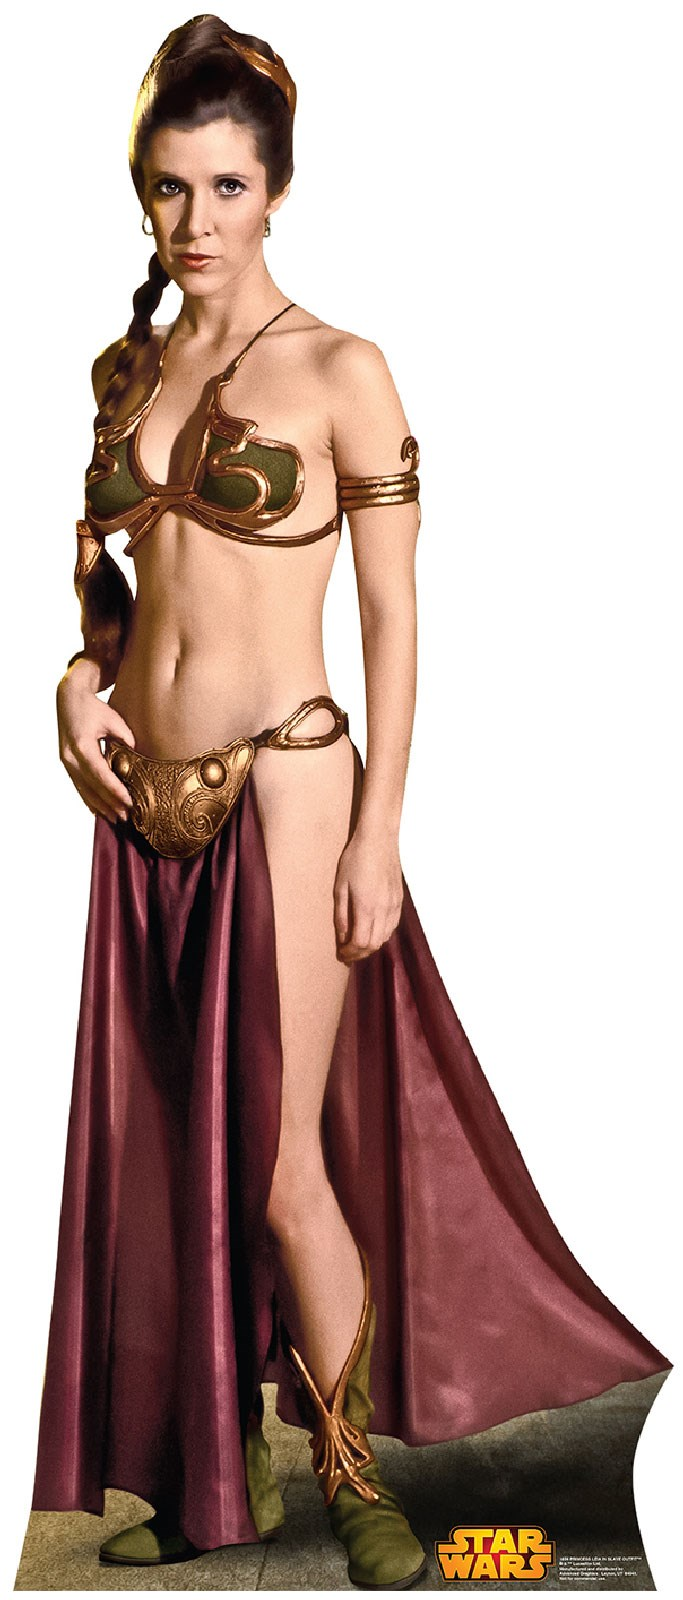 Star Wars Princess Leia Cardboard Stand Up 5.4